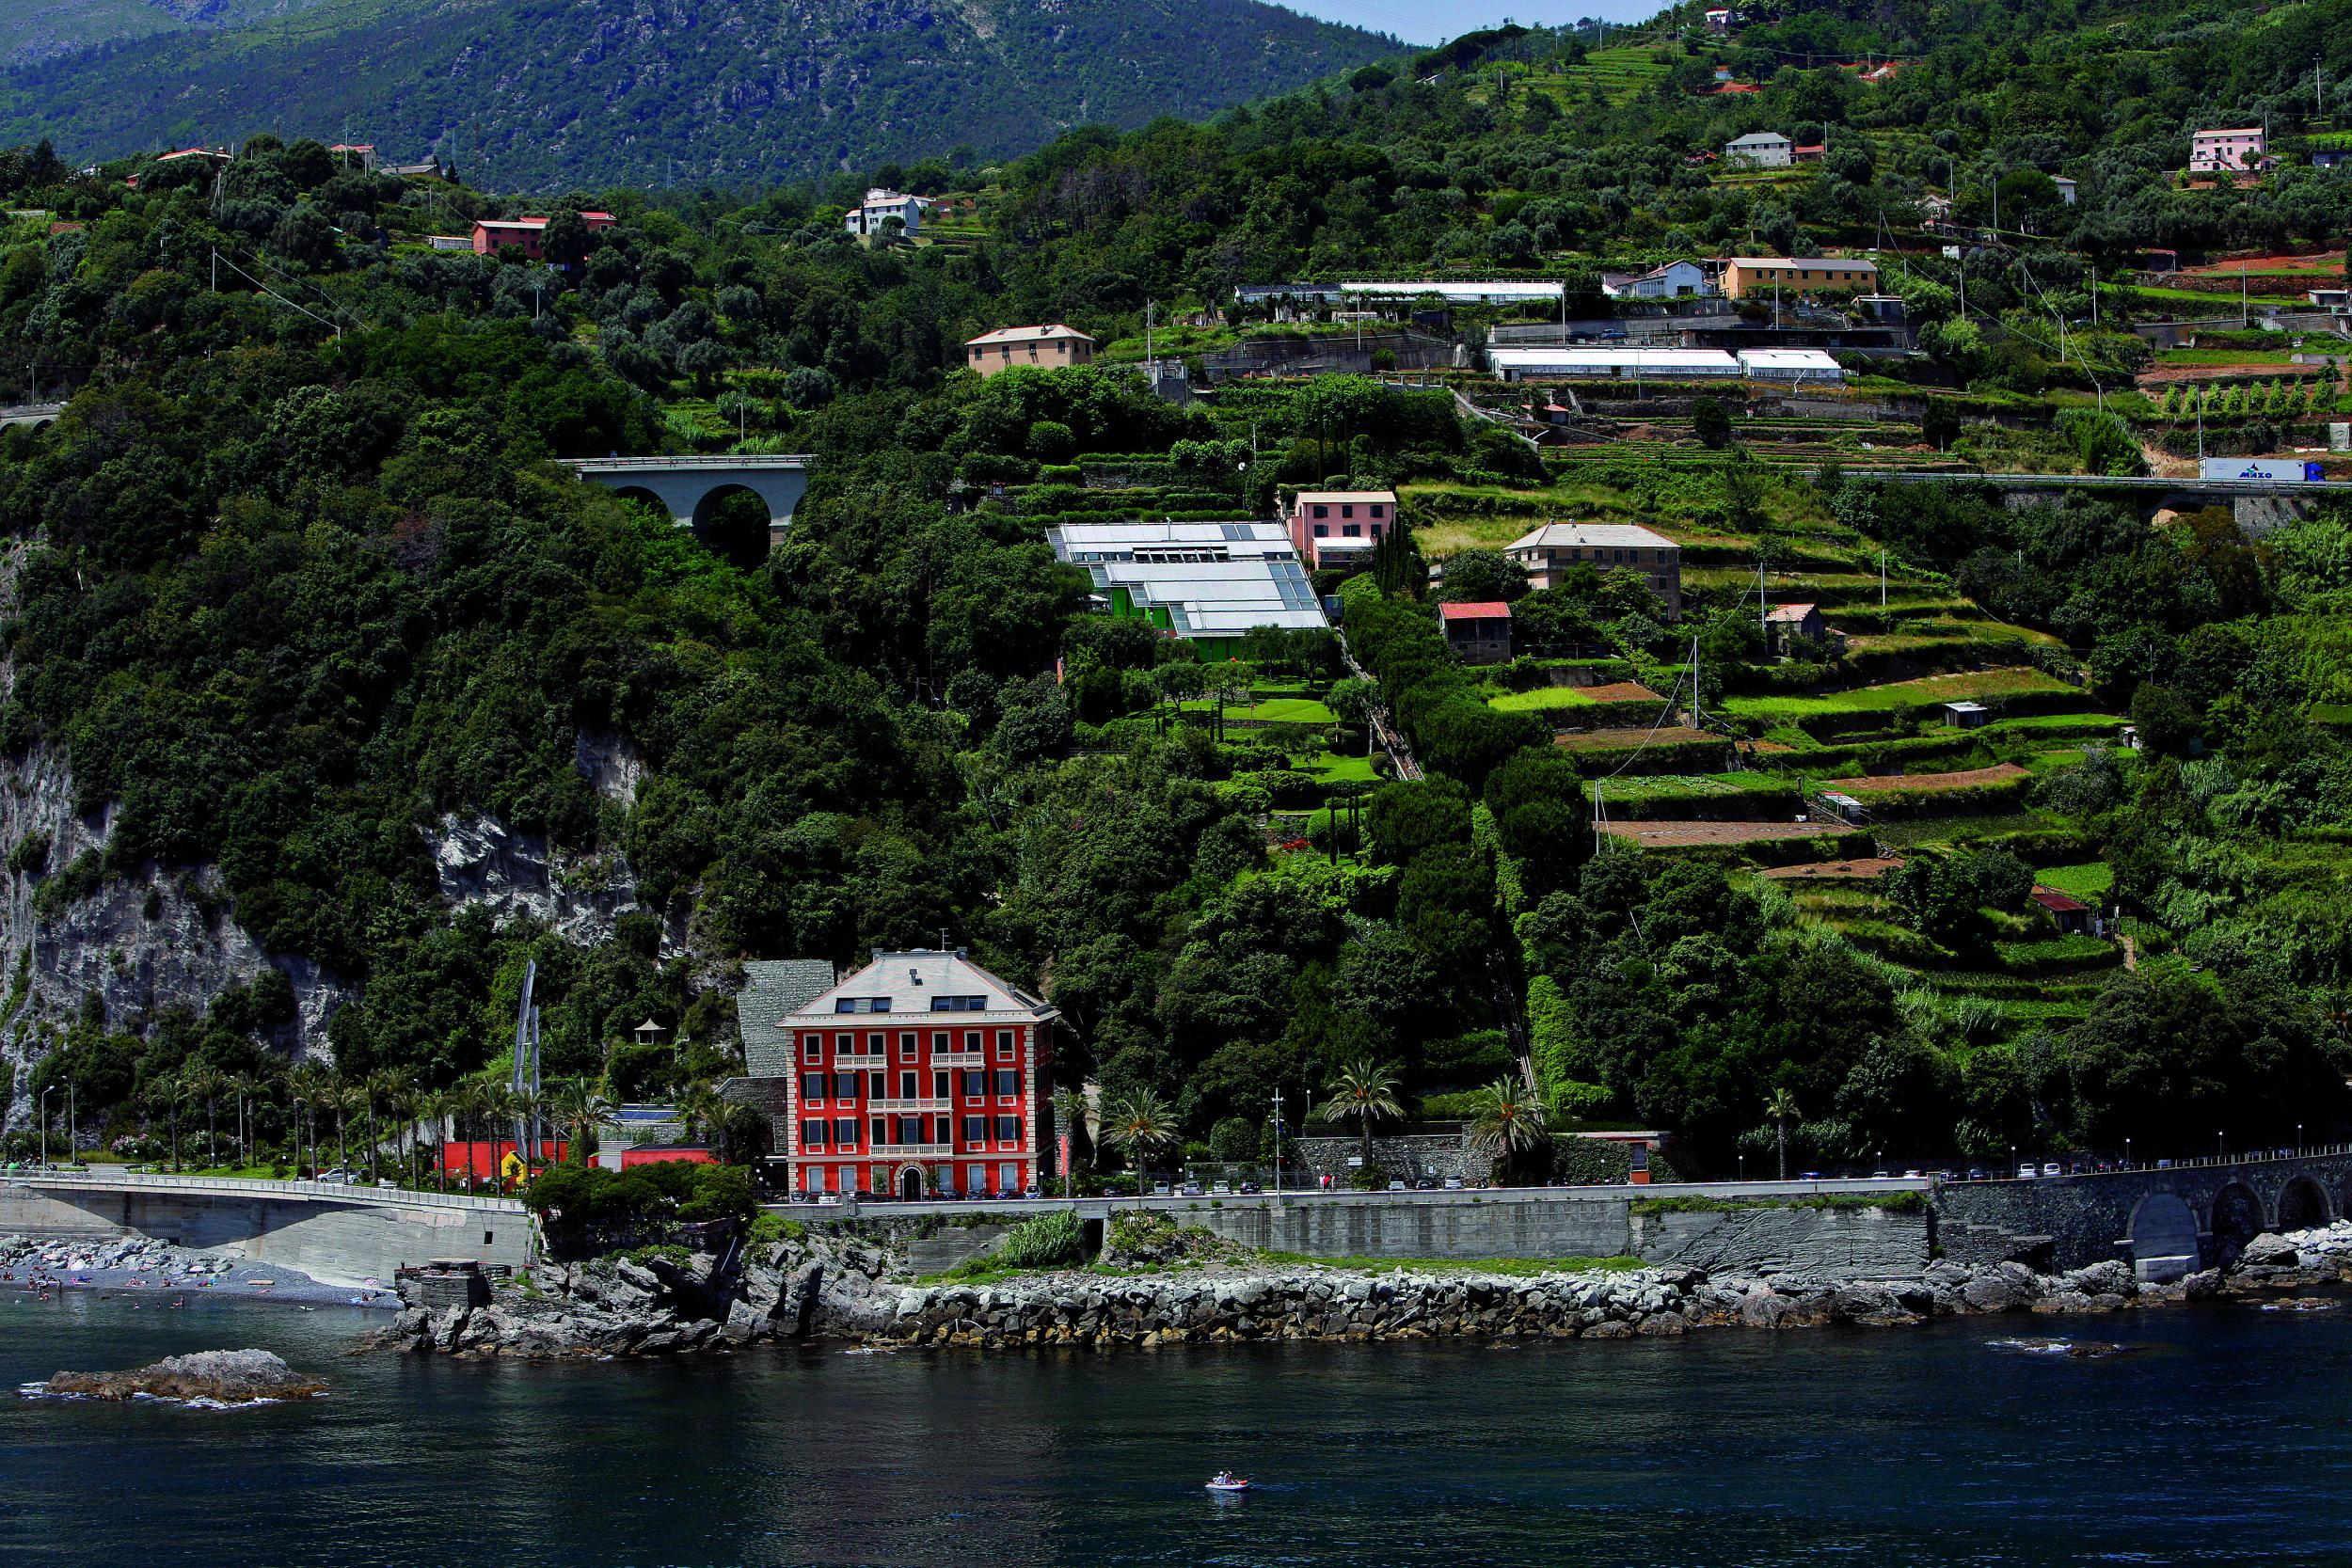 Renzo Piano's Genoa: A tour of the Italian architect's greatest